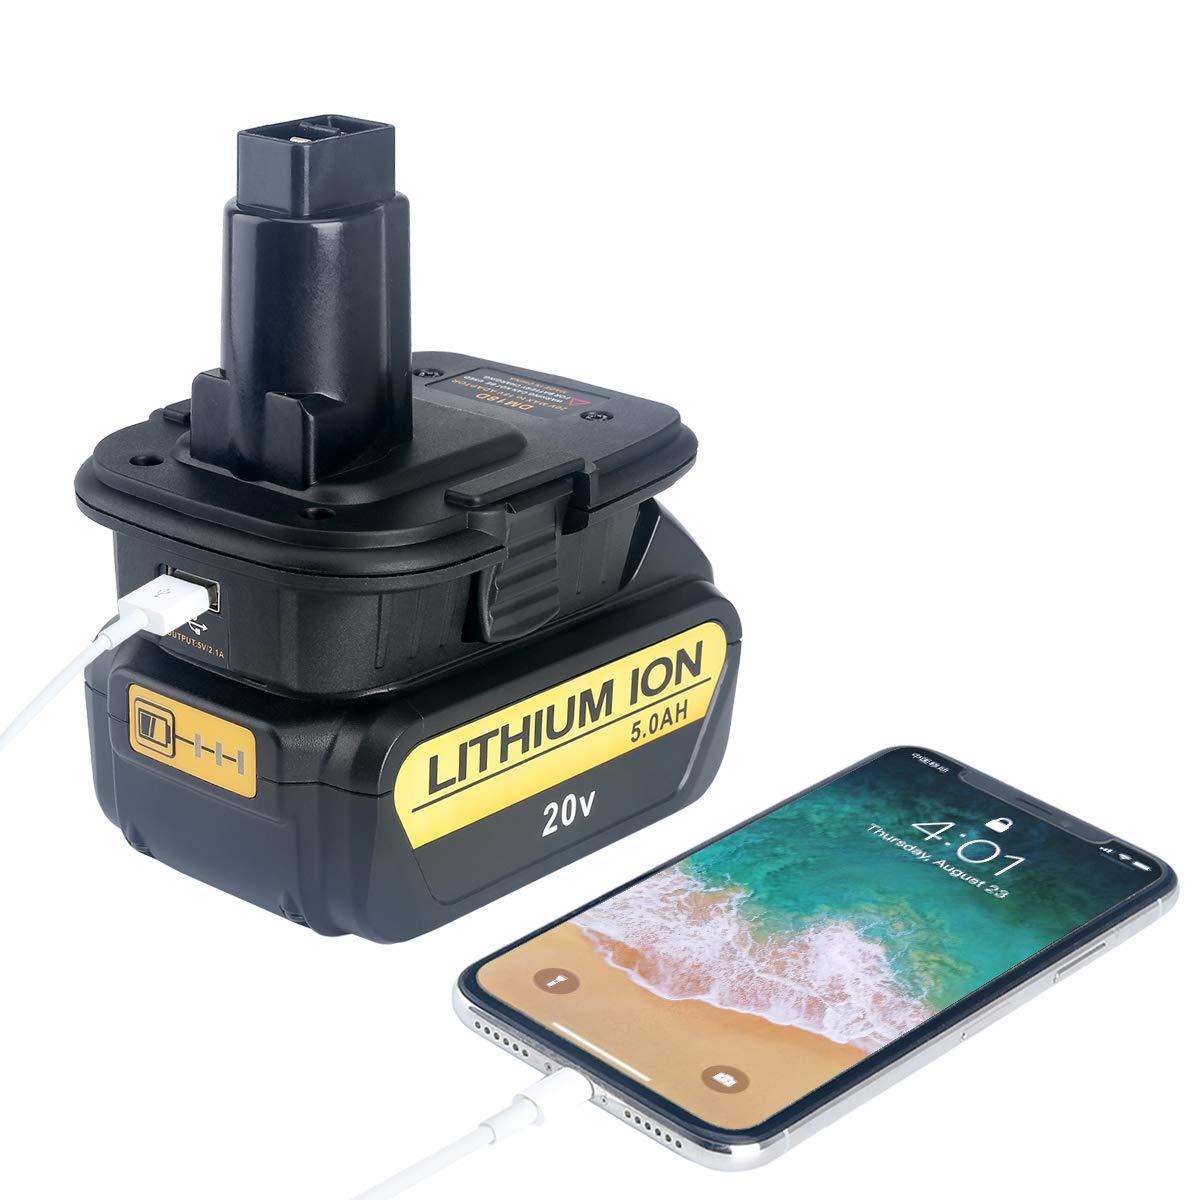 Lasica 20V Battery Adapter DCA1820 with USB port for Dewalt 18V Tools, Convert Milwaukee 18V Lithium Battery M18 DeWalt MAX 20Volt Lithium-Ion Battery DCB204 to DeWalt 18V NiCad NiMh Battery DC9096 by Lasica (Image #5)